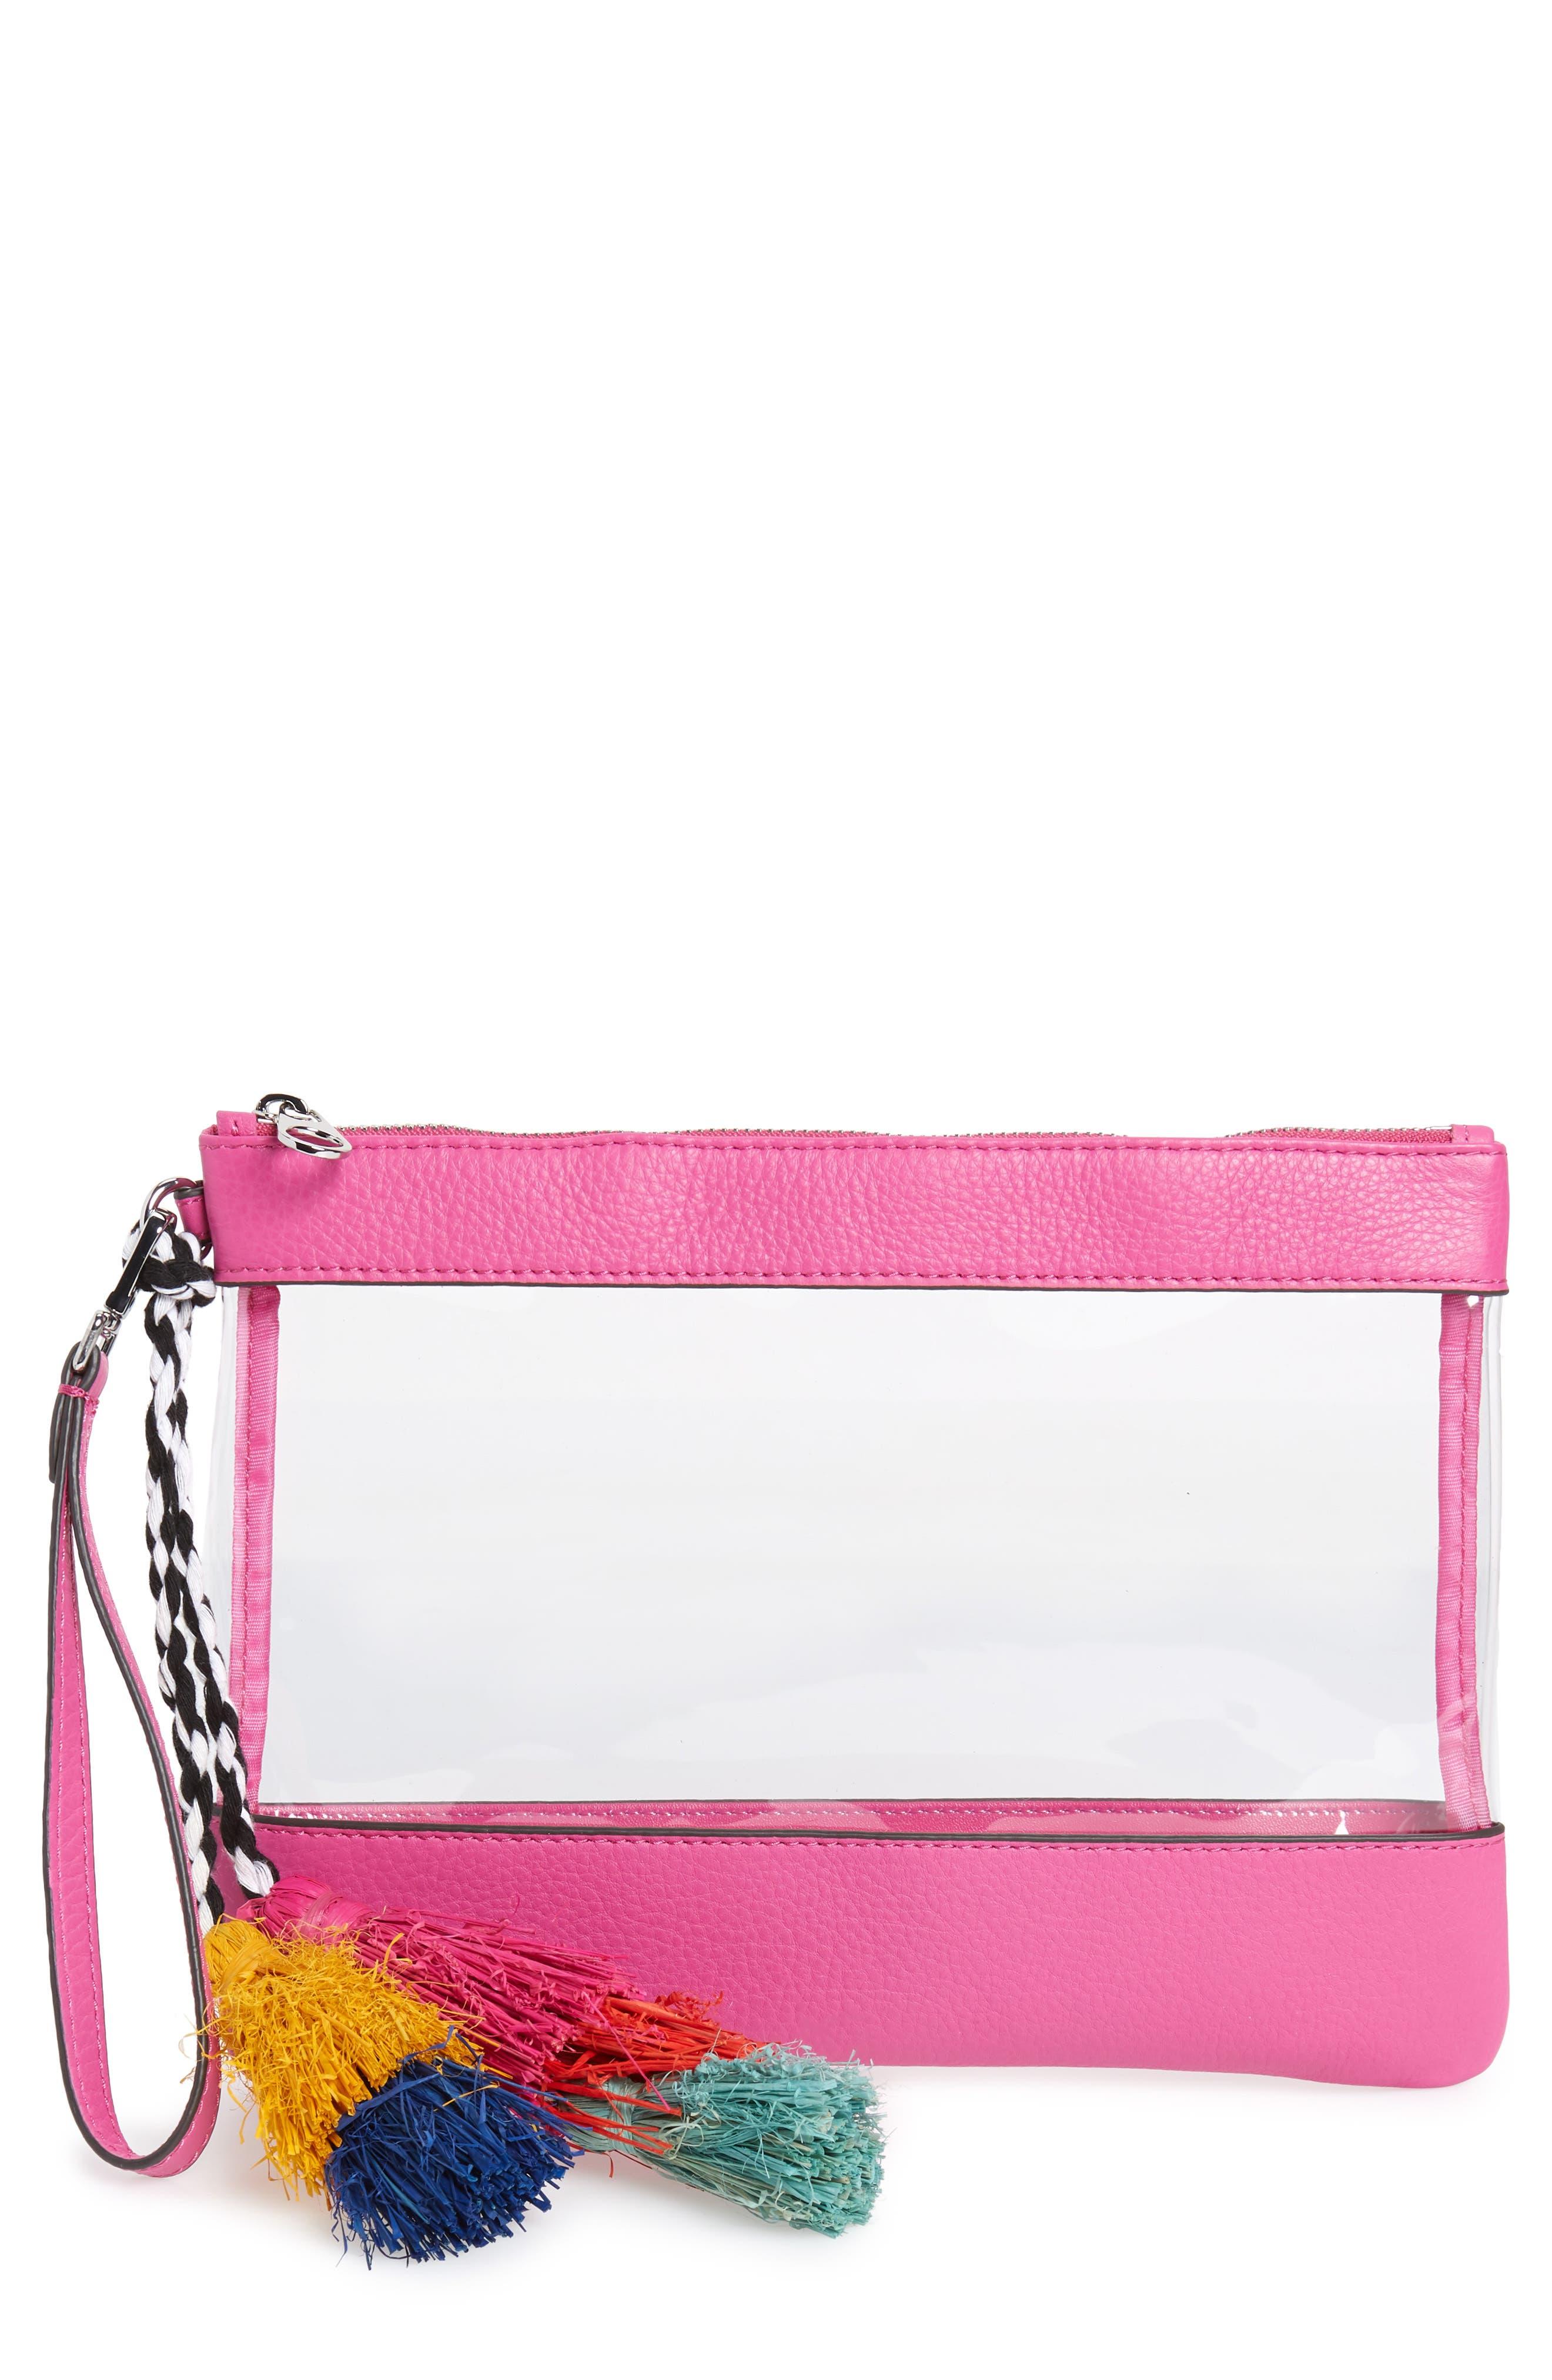 Thore Clear Tassel Wristlet Clutch,                             Main thumbnail 1, color,                             Phlox Pink/ Clear